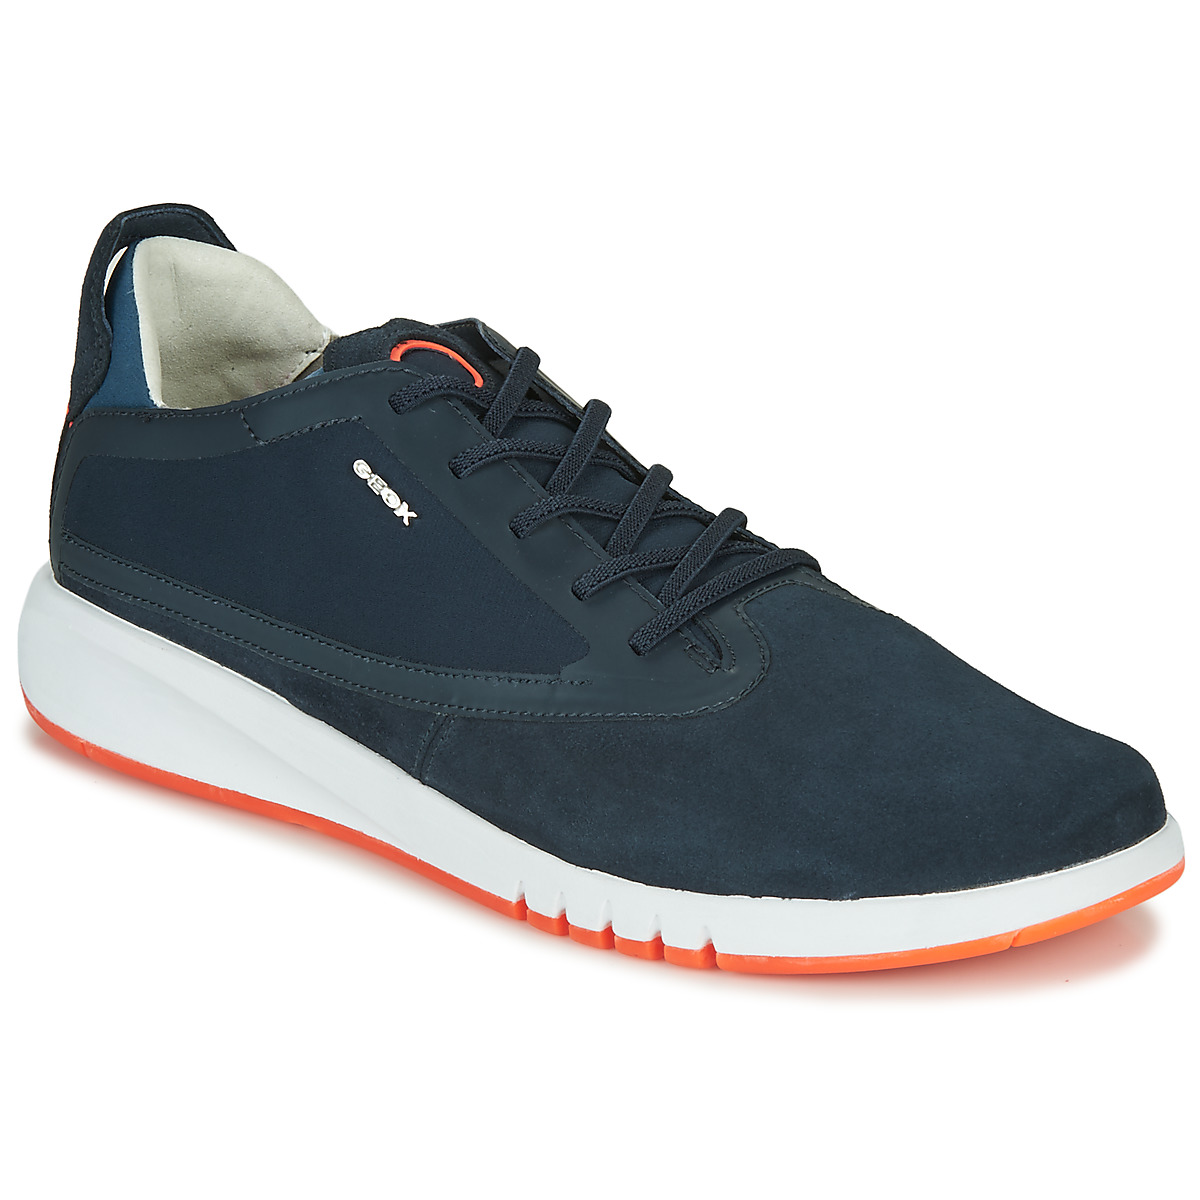 Geox U Aerantis Marine Scarpe Sneakers Basse Uomo 94 50